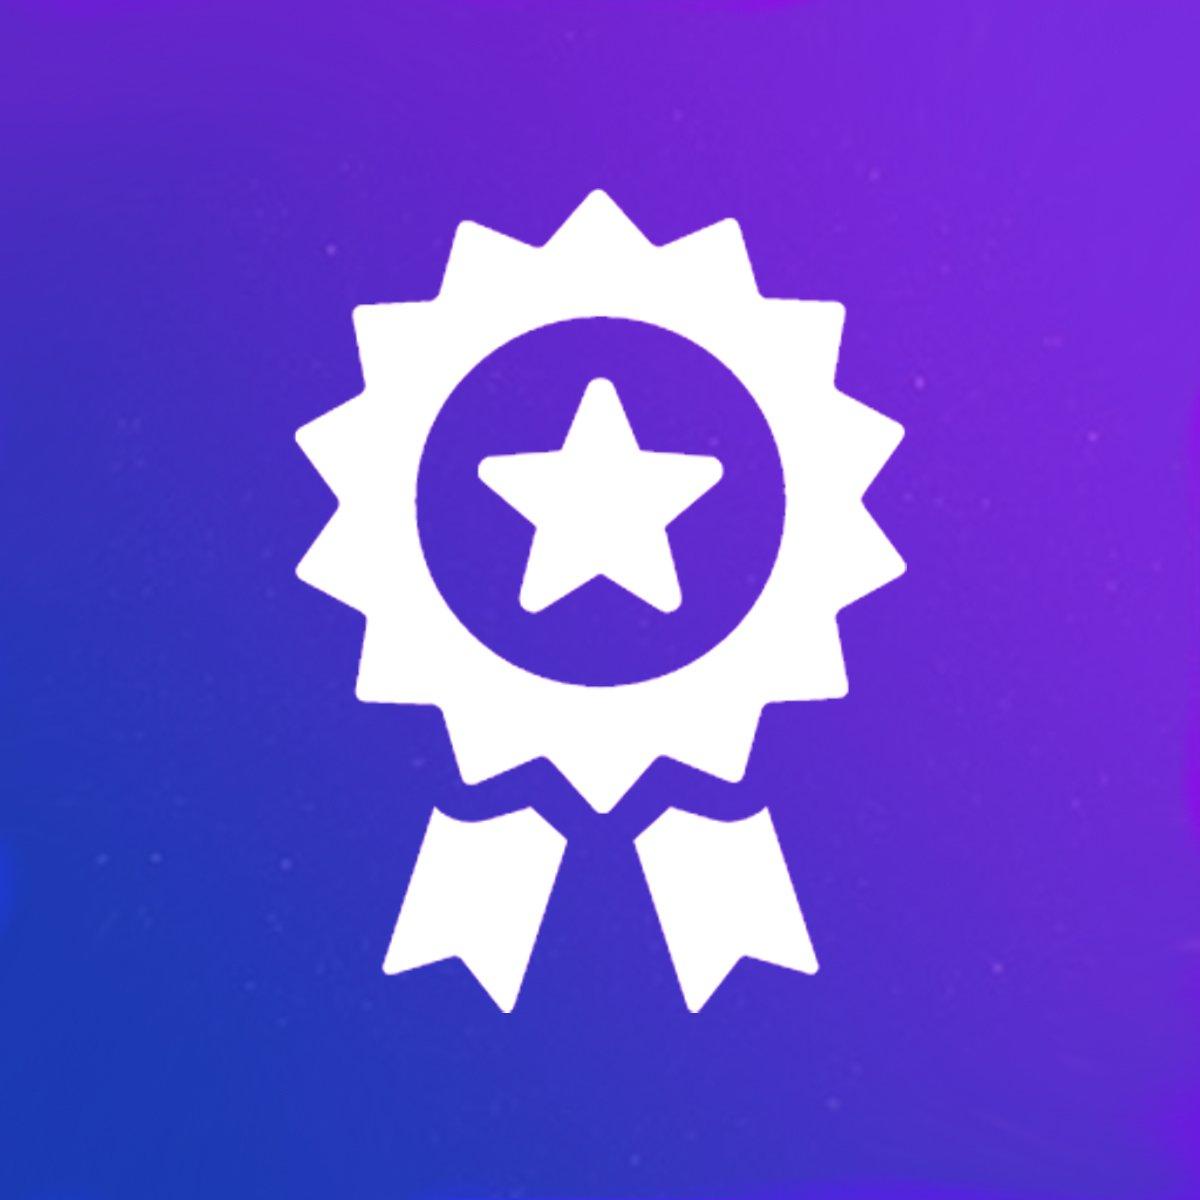 Shopify Trust Badge app by Pixelab